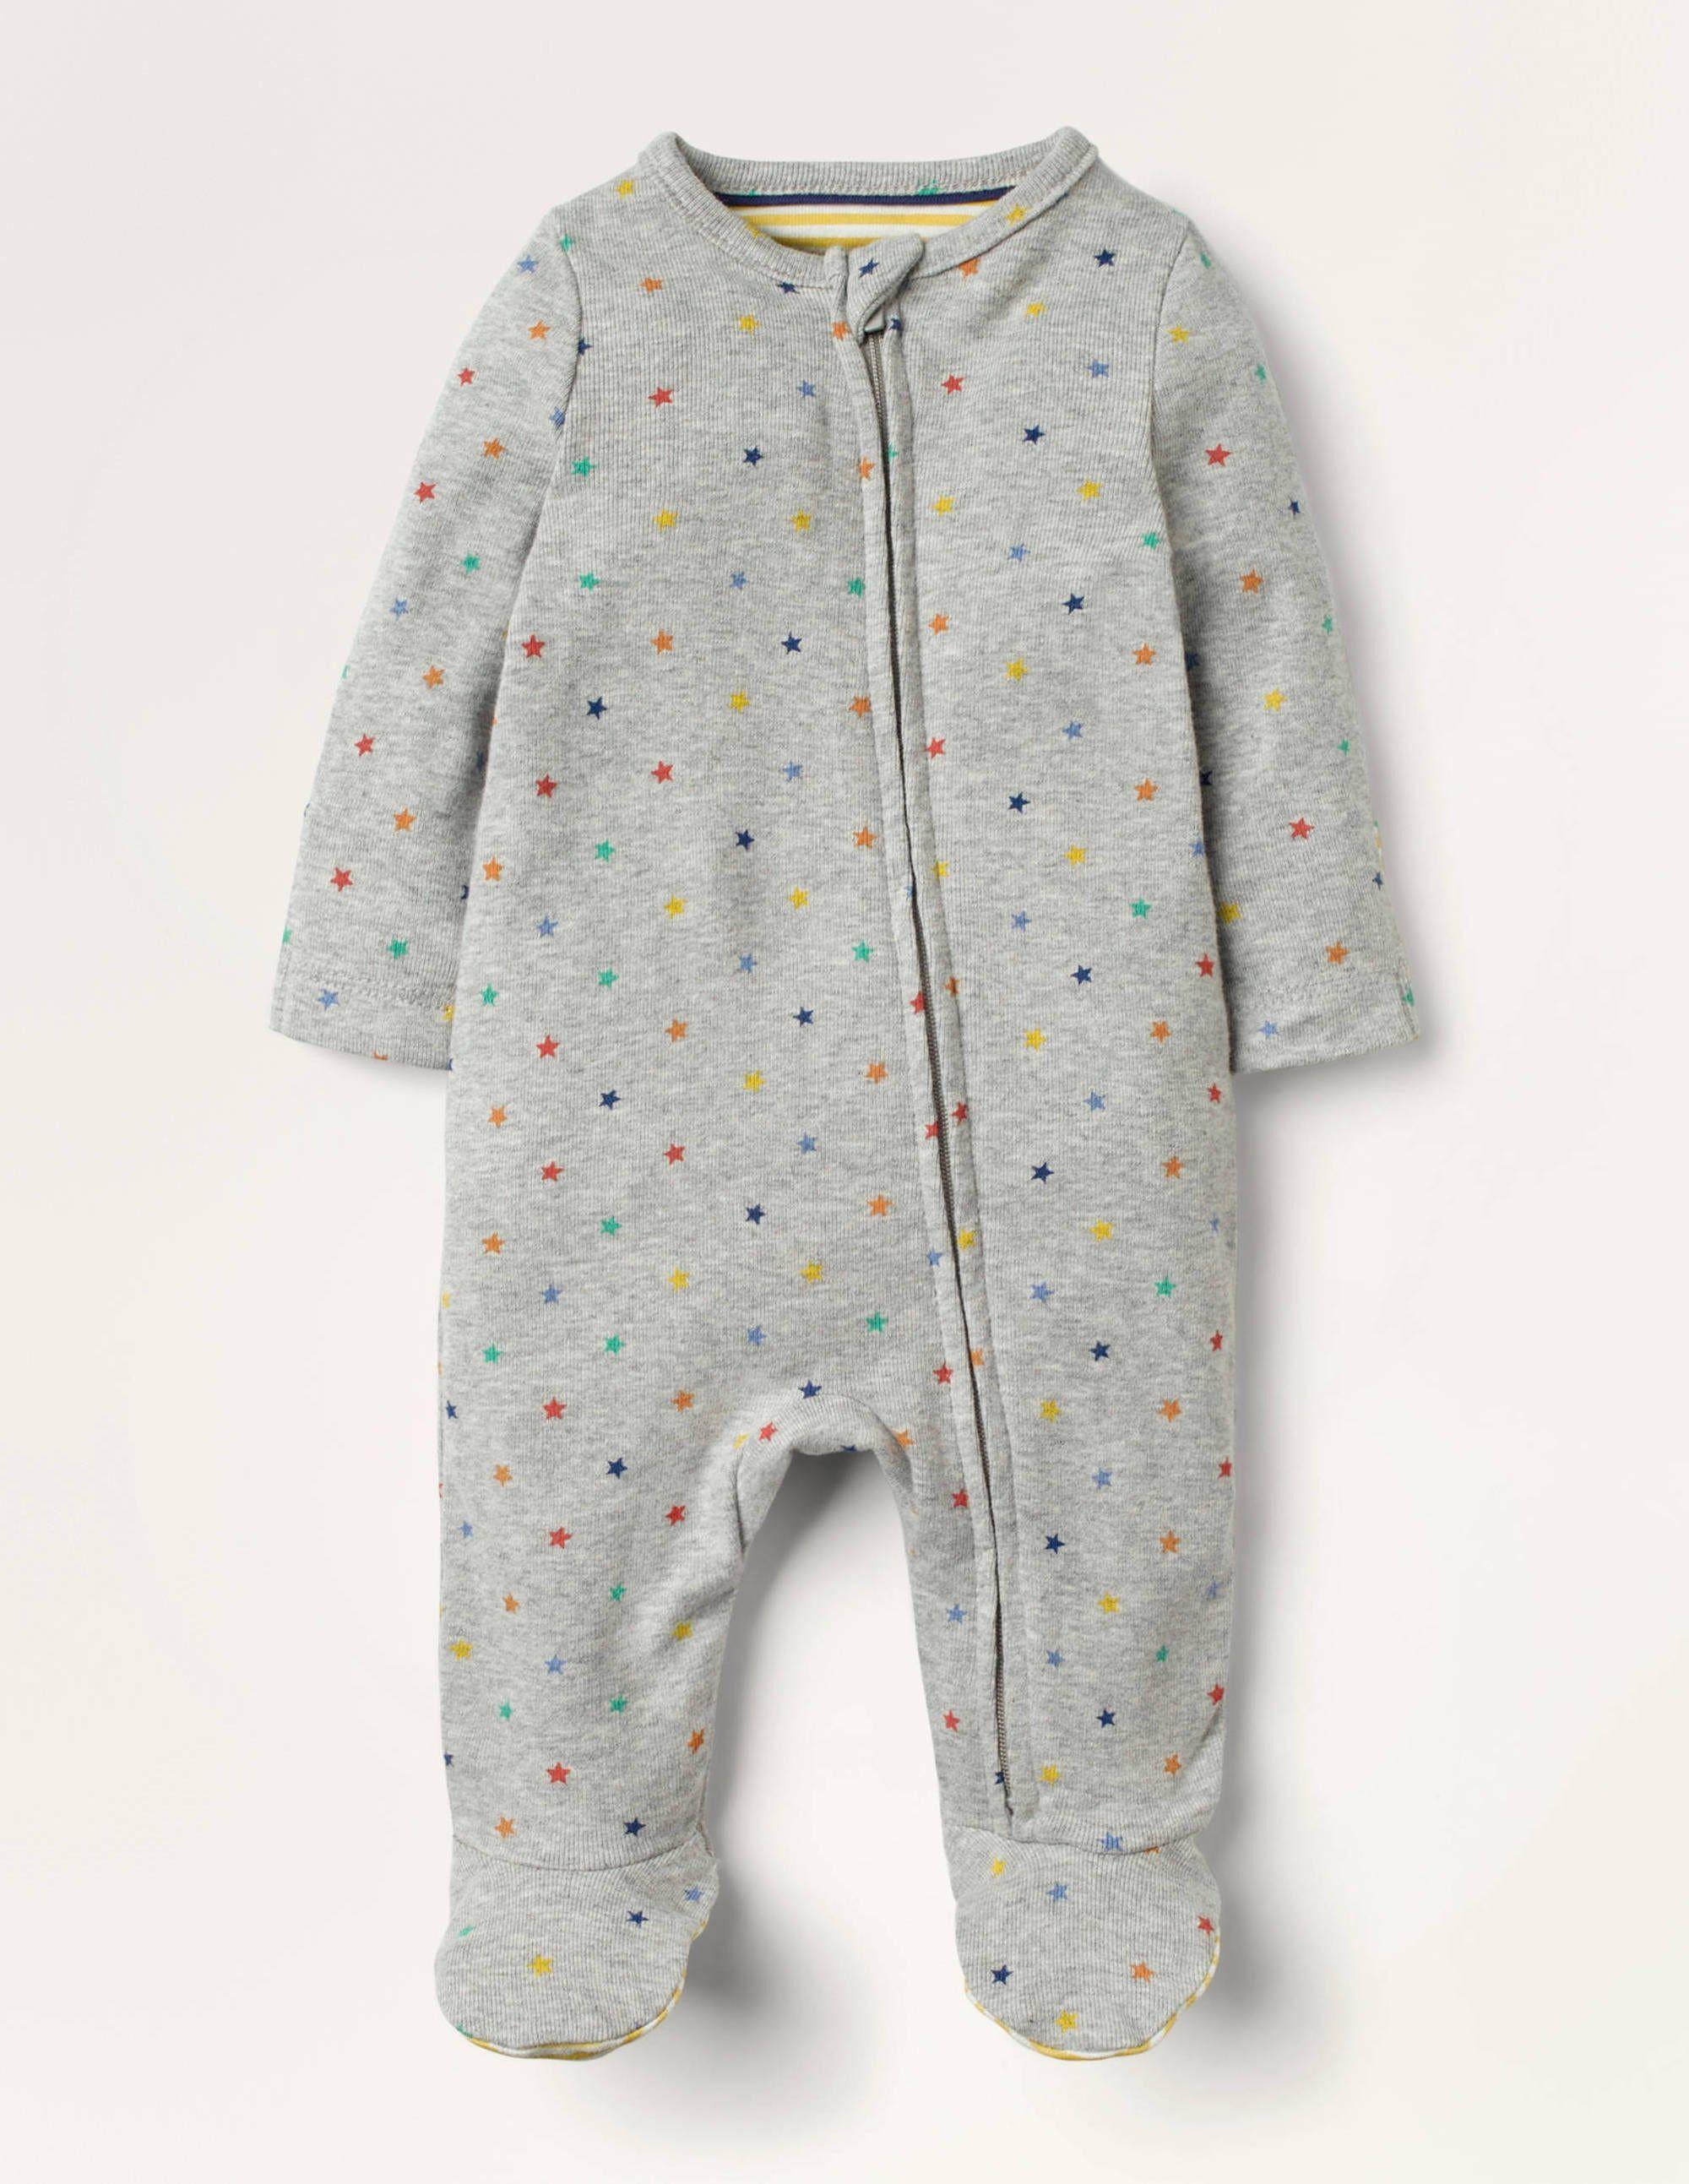 Baby Grenouillère zippée ultra-douce à motif étoile GRY Bébé Boden, Grey - 3-6m